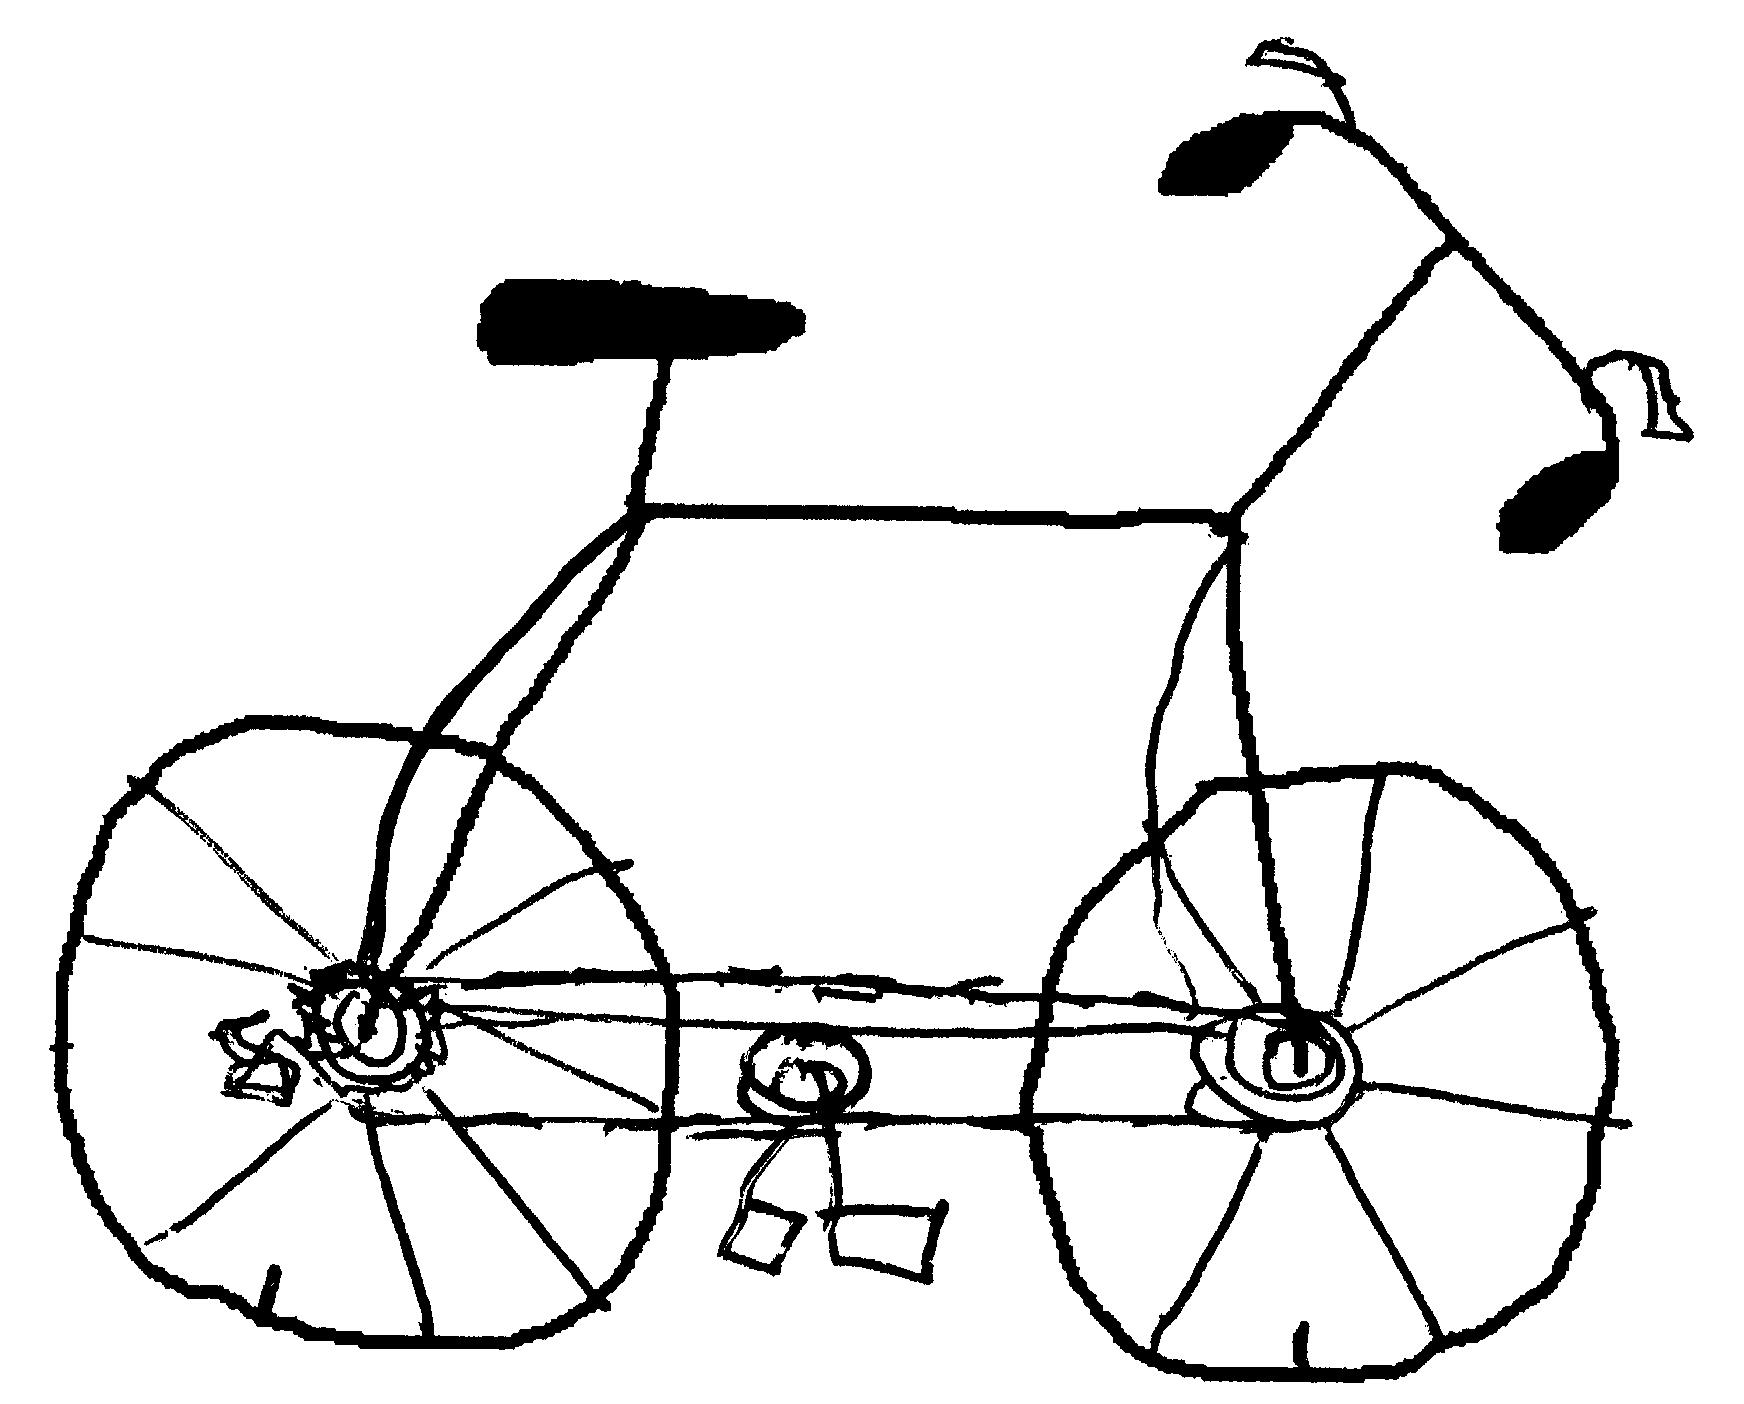 Image result for old broken cycle sketch